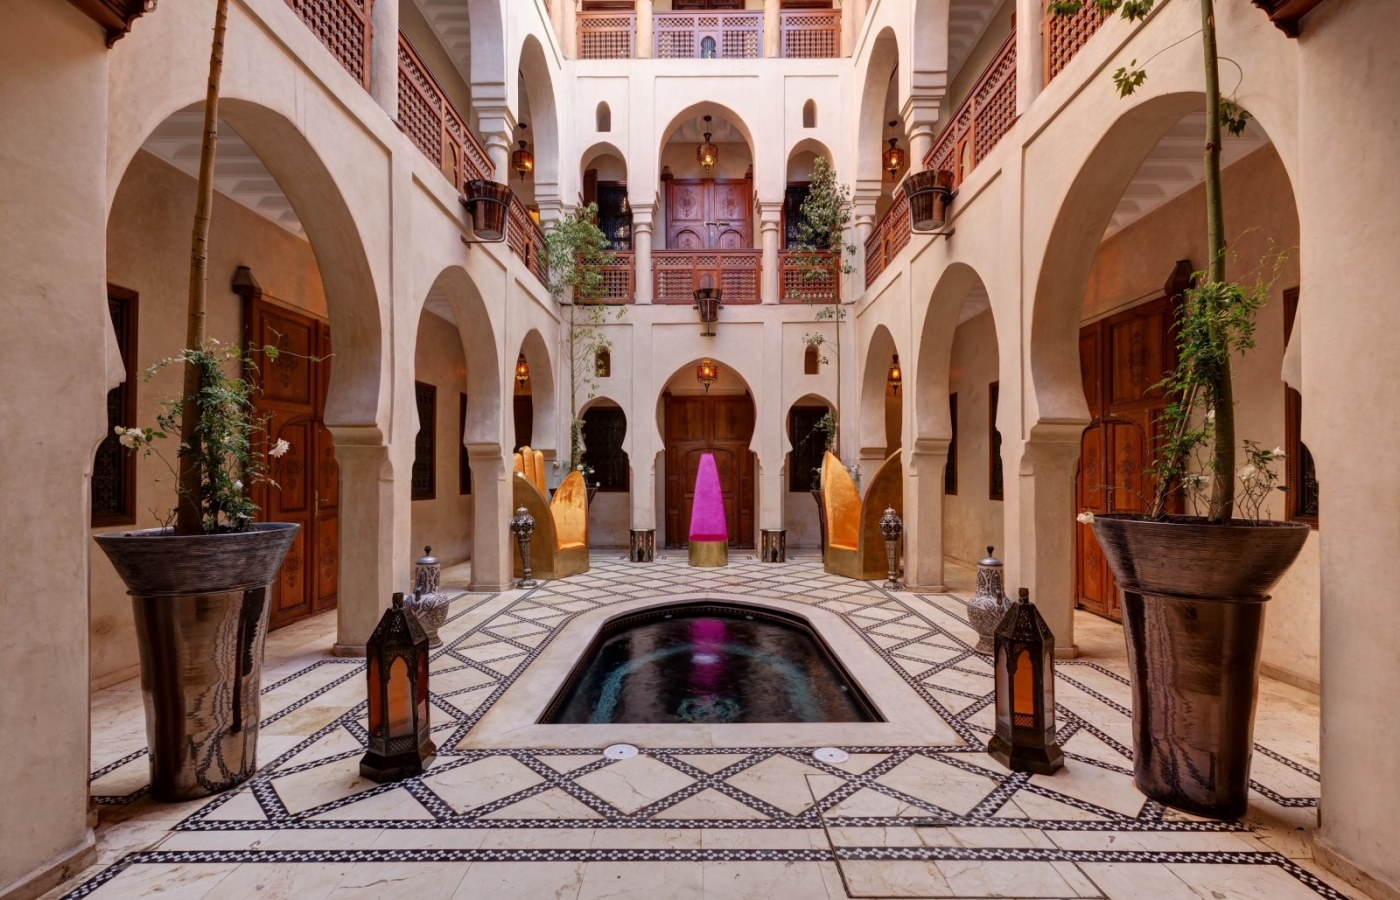 Riad di Marrakech